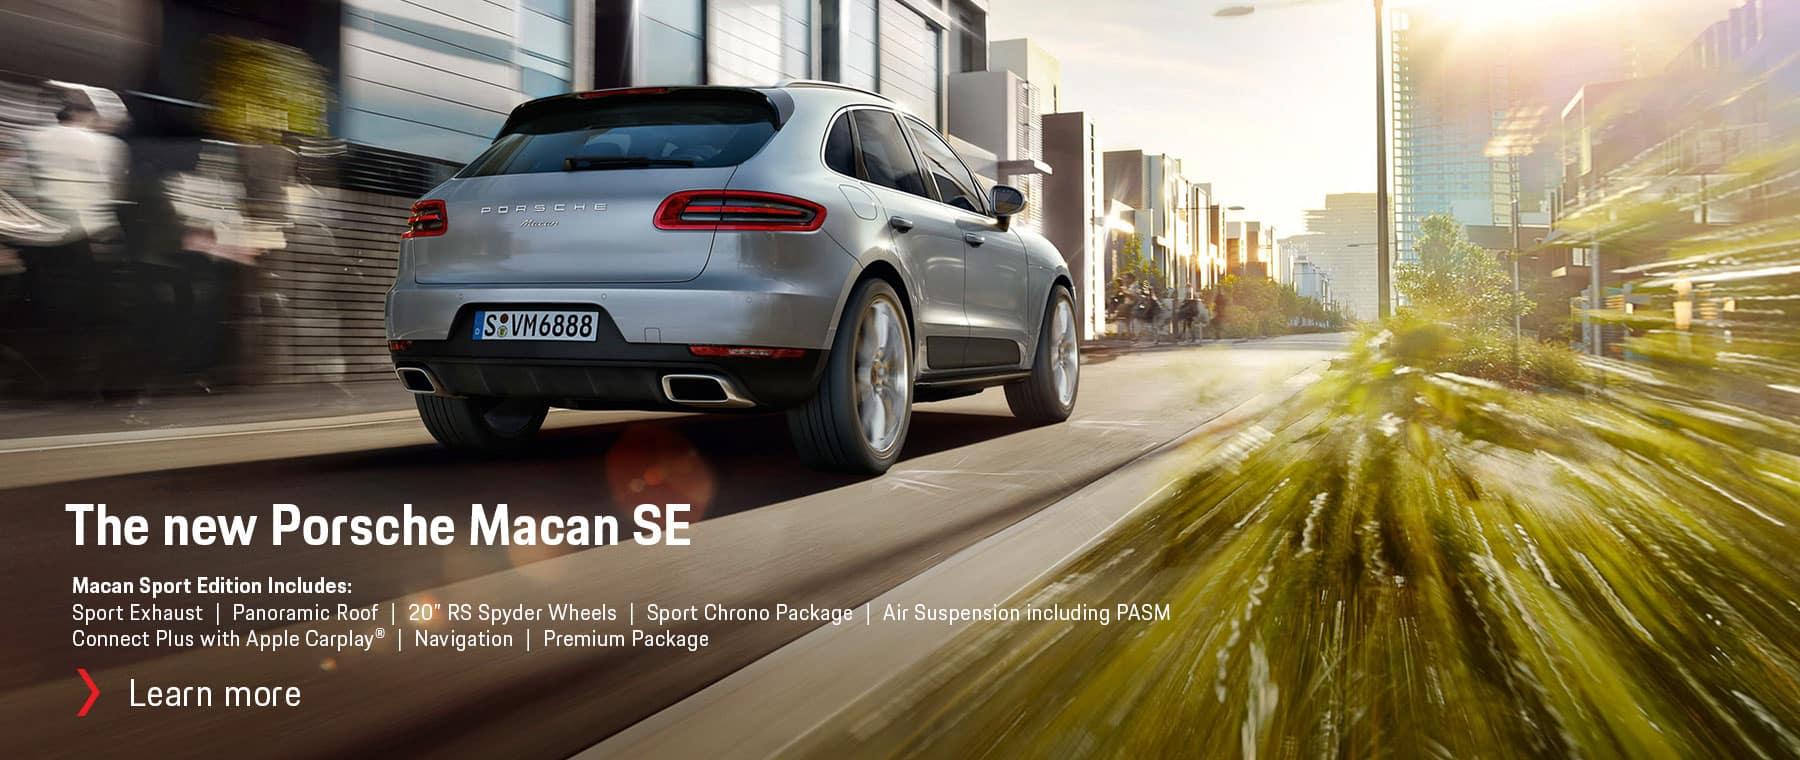 Sewickley Porsche New Used Luxury Car Dealer In Automotivepictures 4163321997sc1alternatorwirediagram1jpg Welcome To